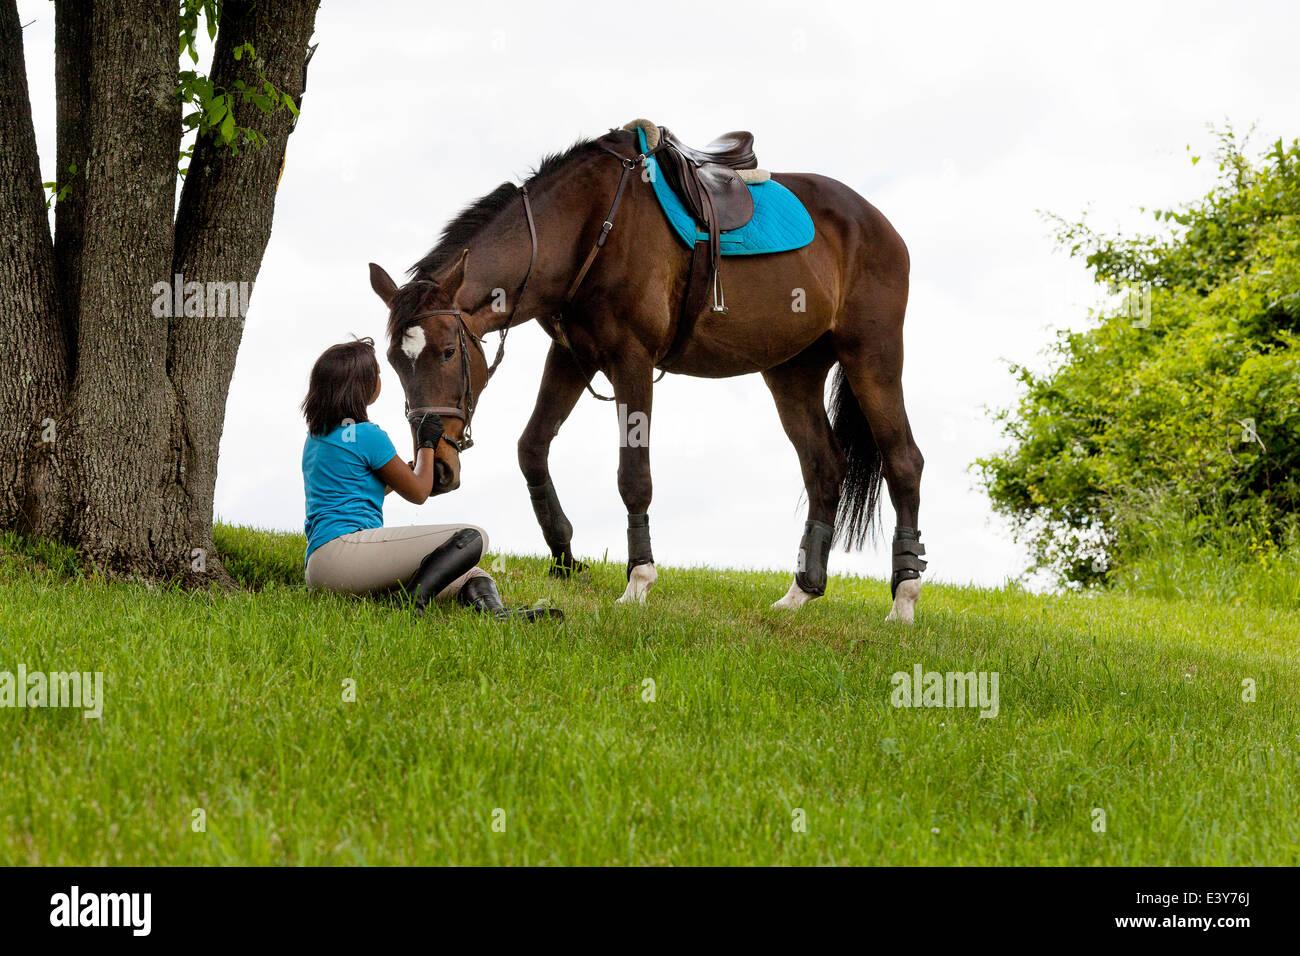 Jinete sentado junto al árbol, junto a caballo Imagen De Stock